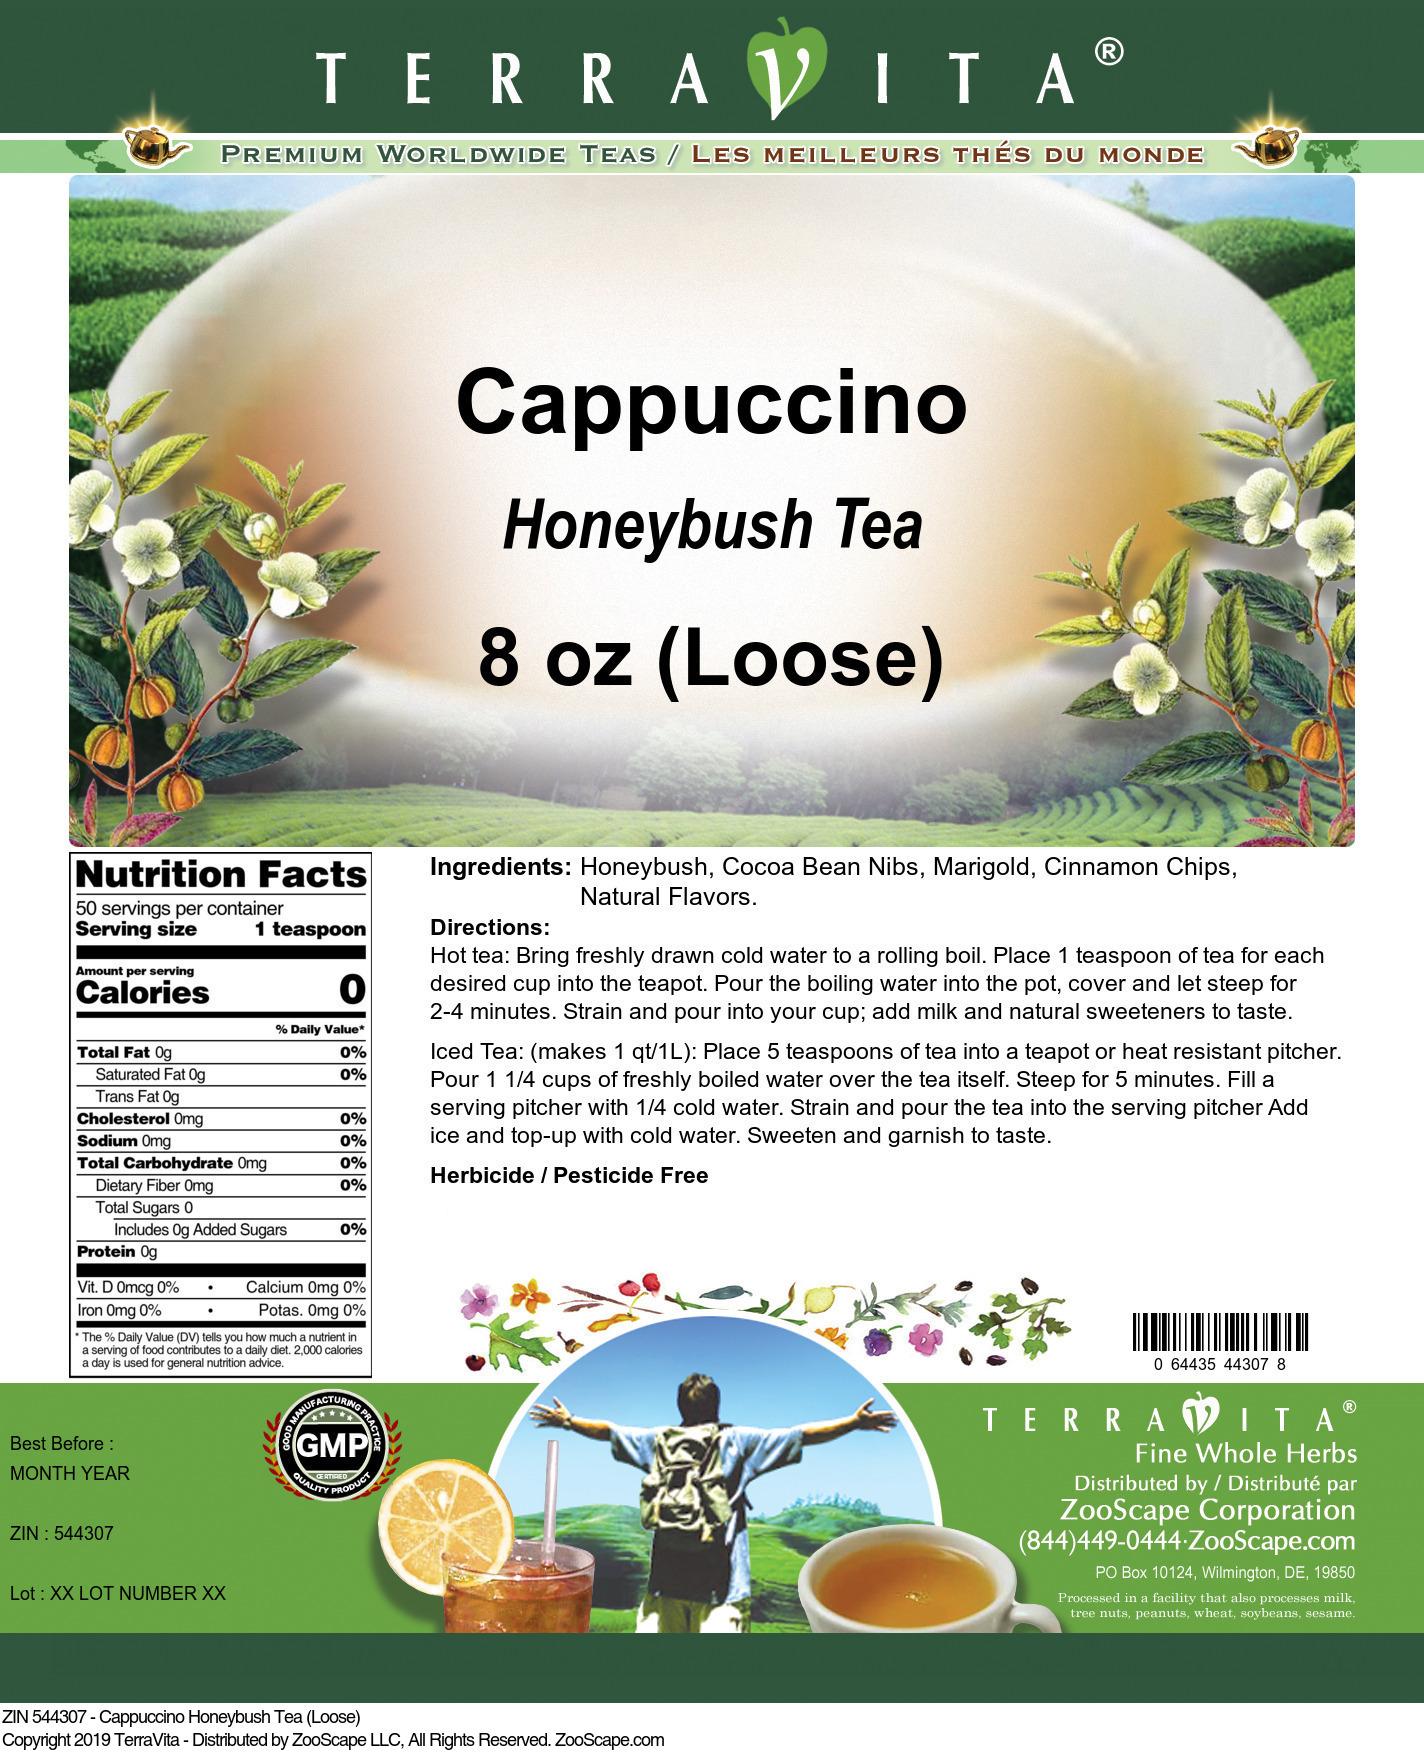 Cappuccino Honeybush Tea (Loose)